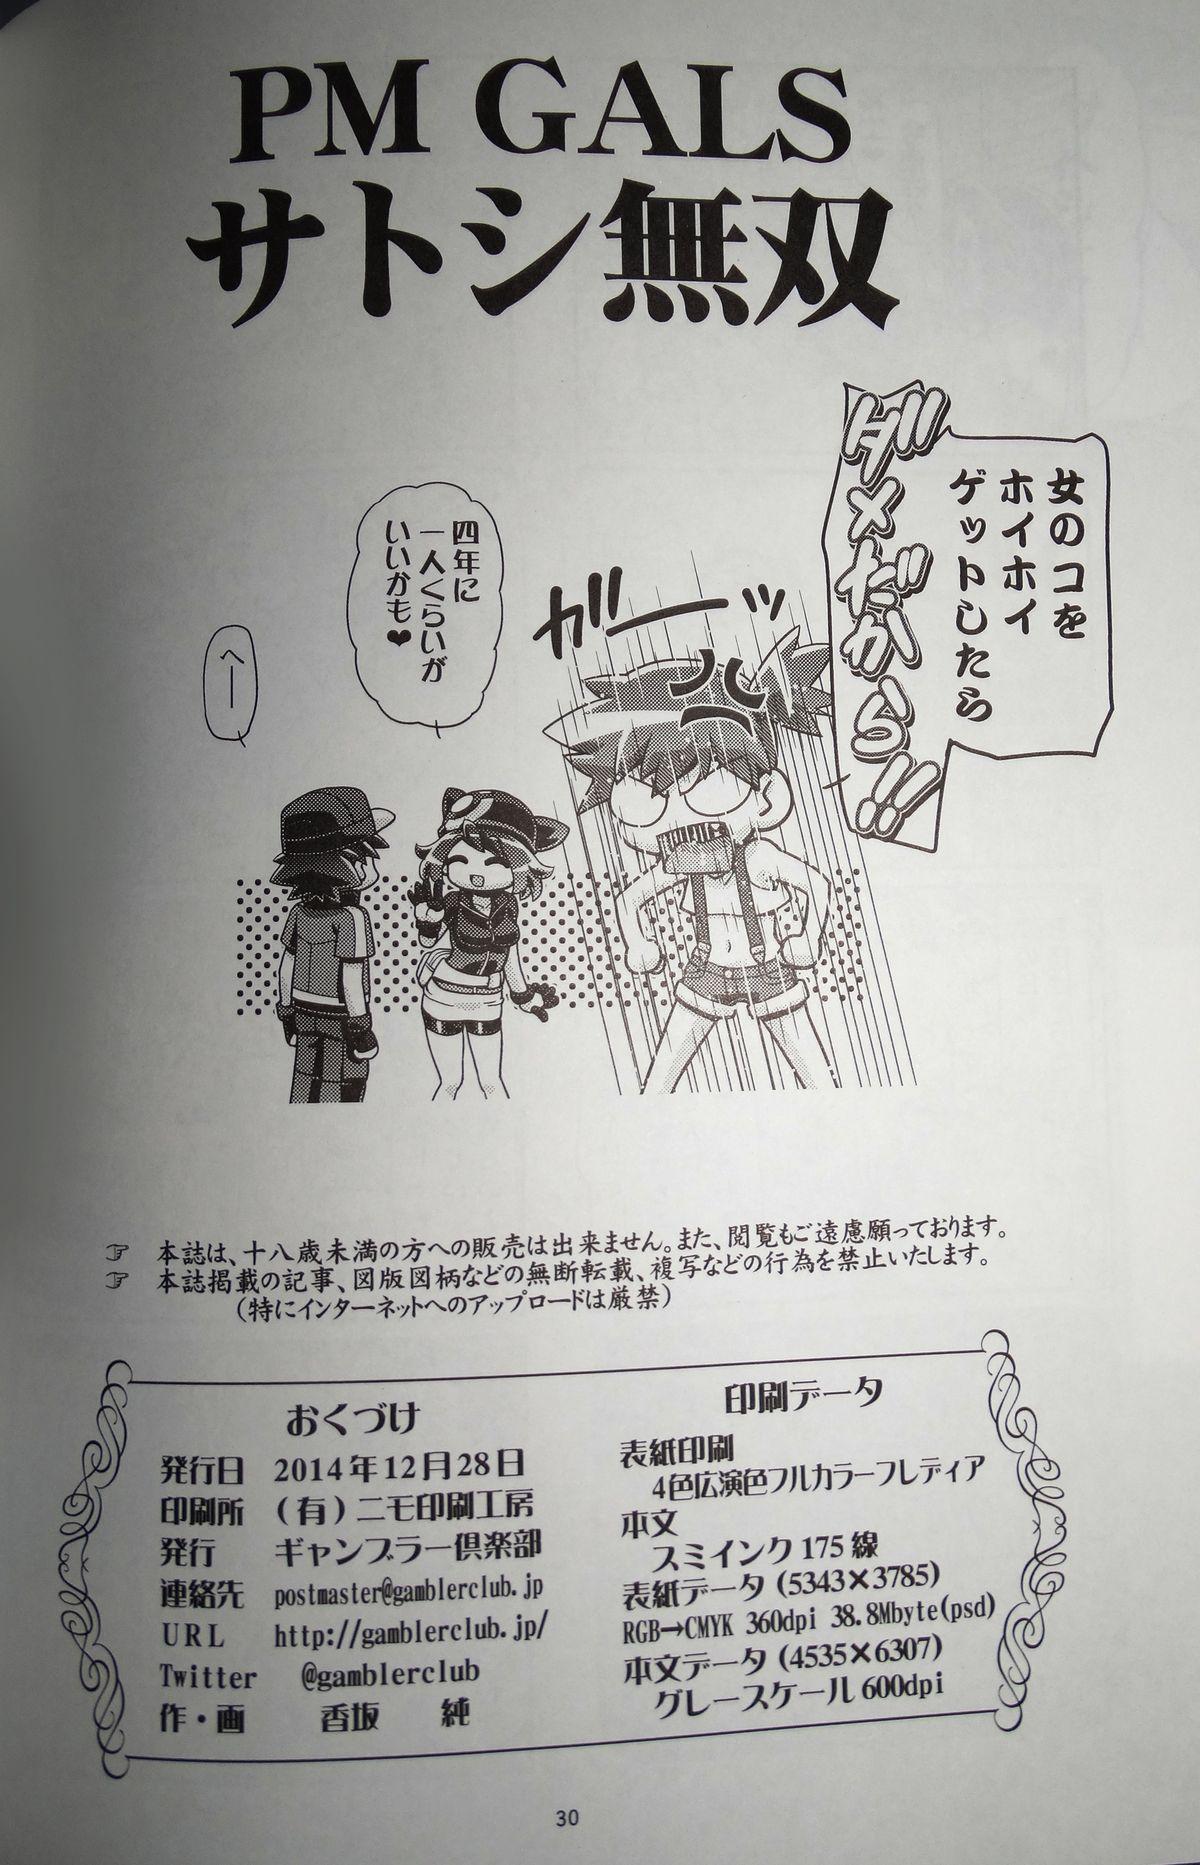 PM GALS Satoshi Musou 28